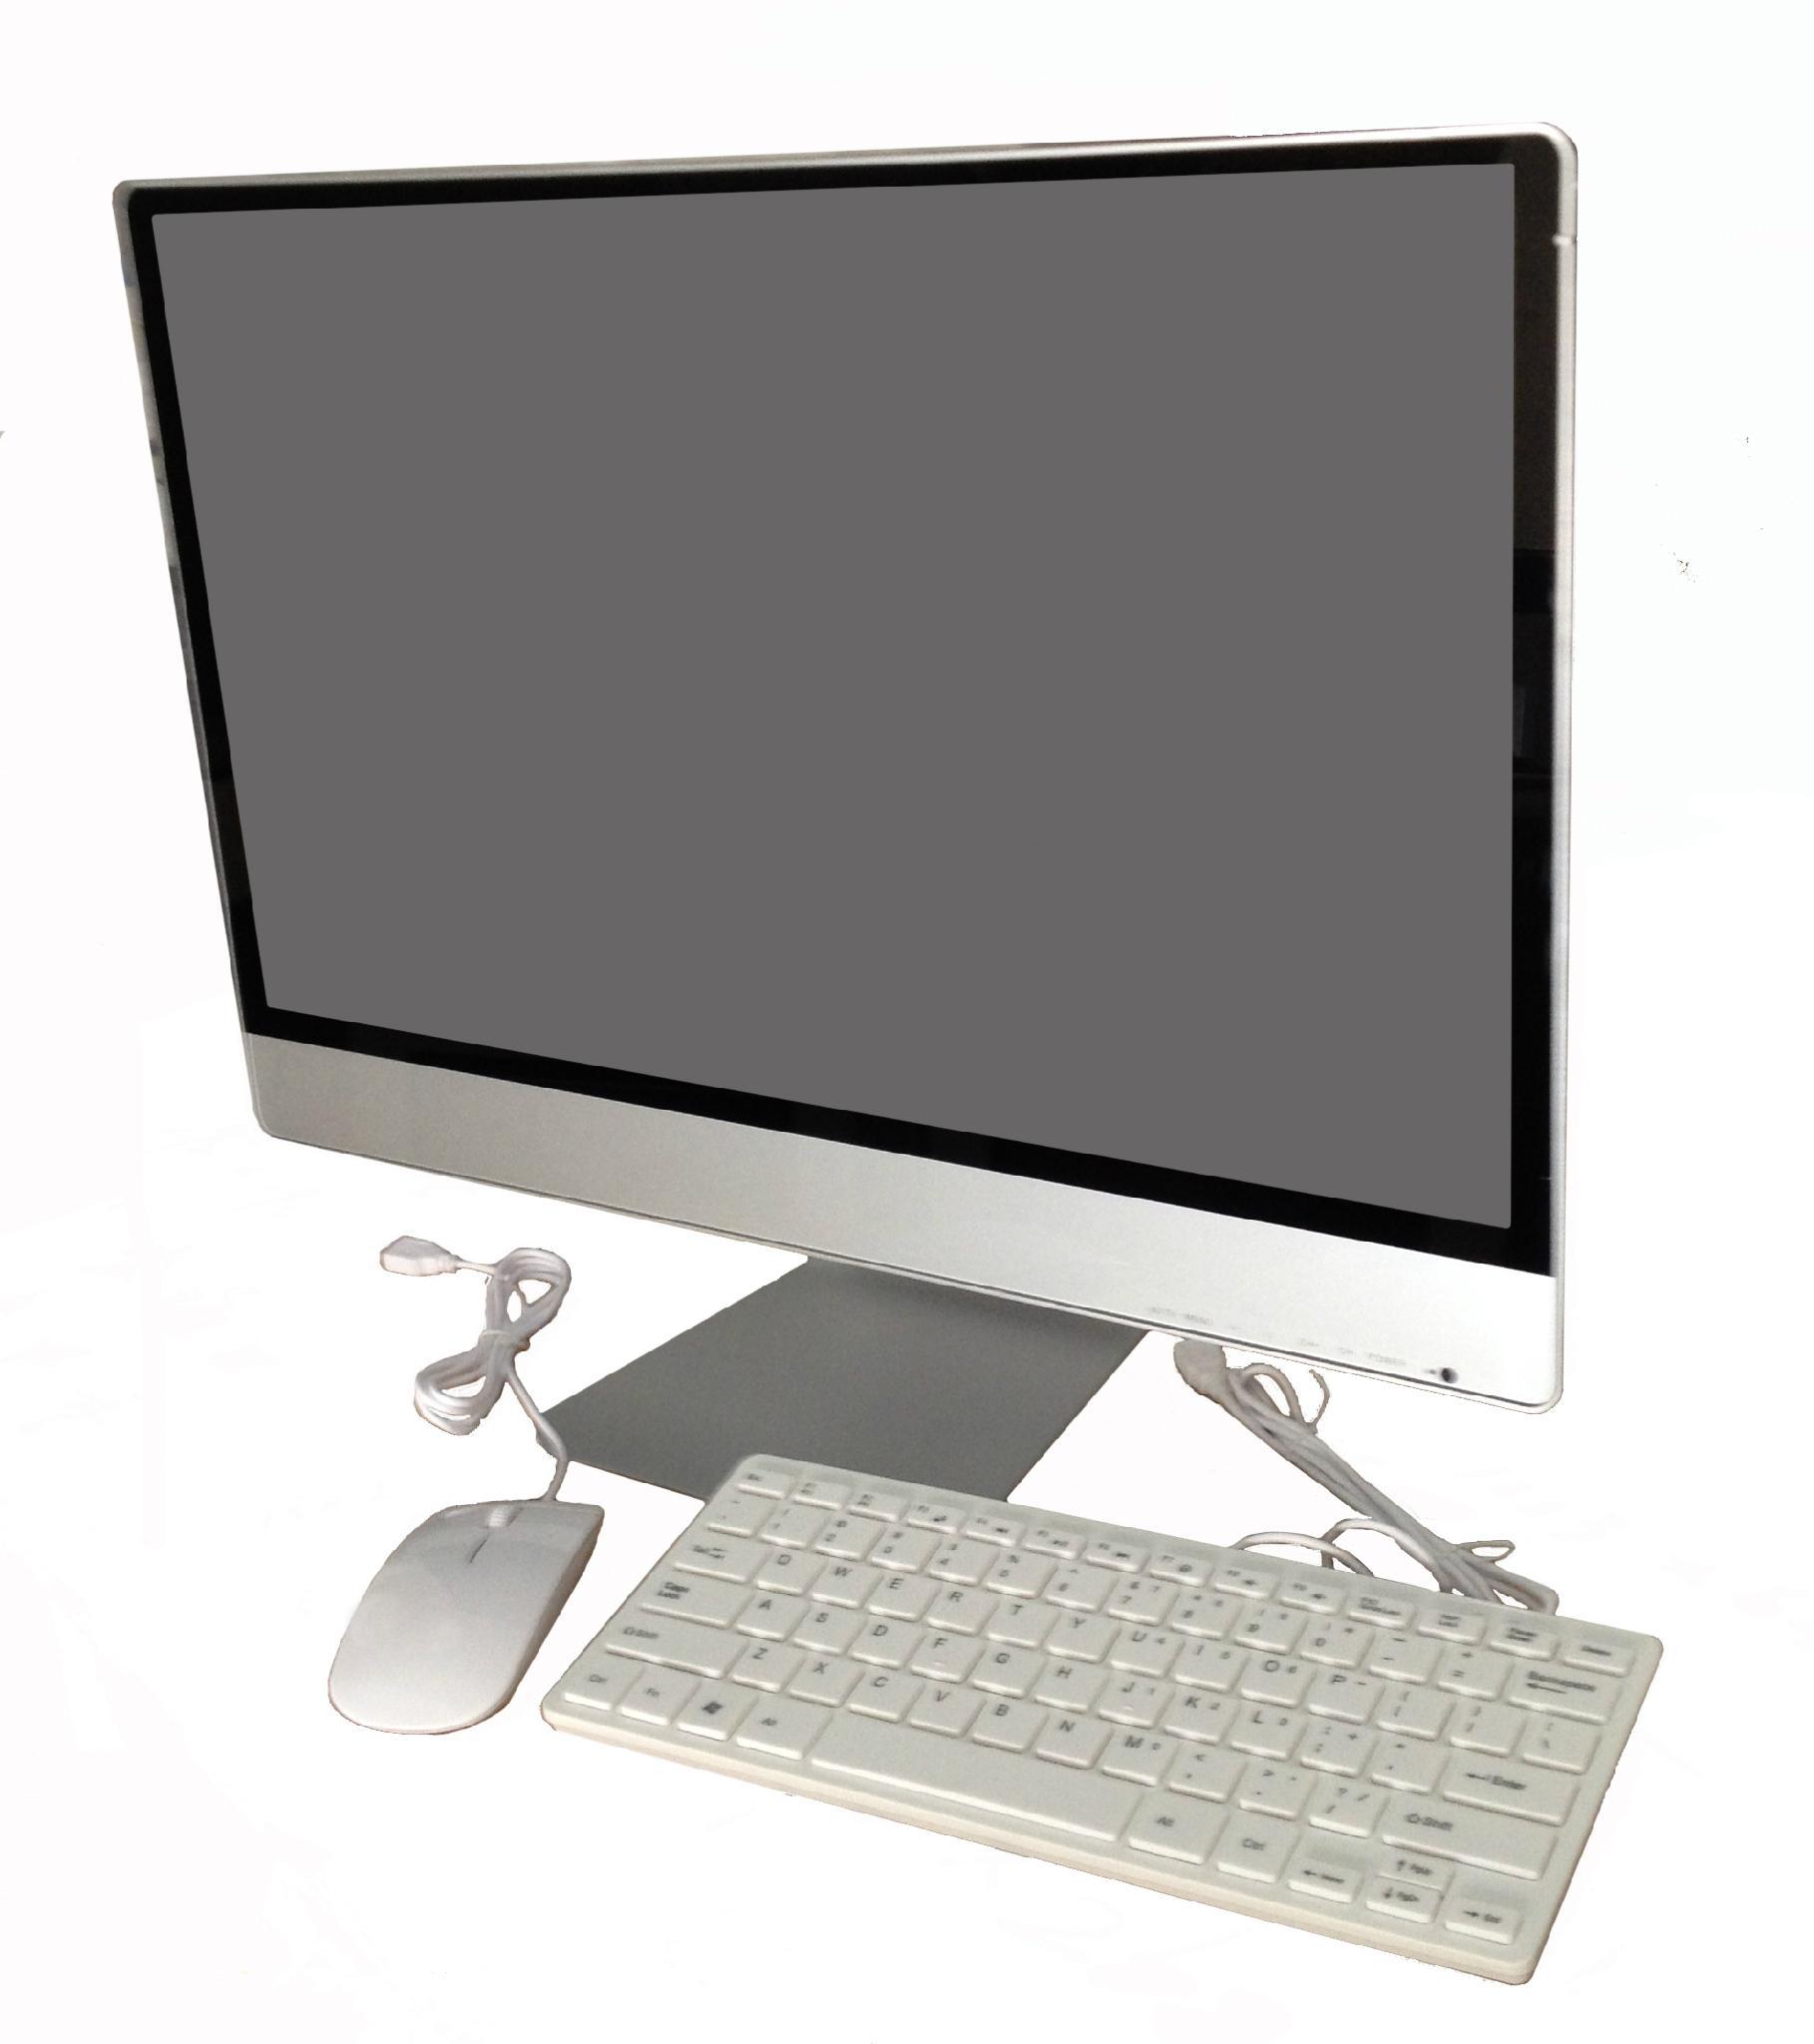 dummy computer model props computer model